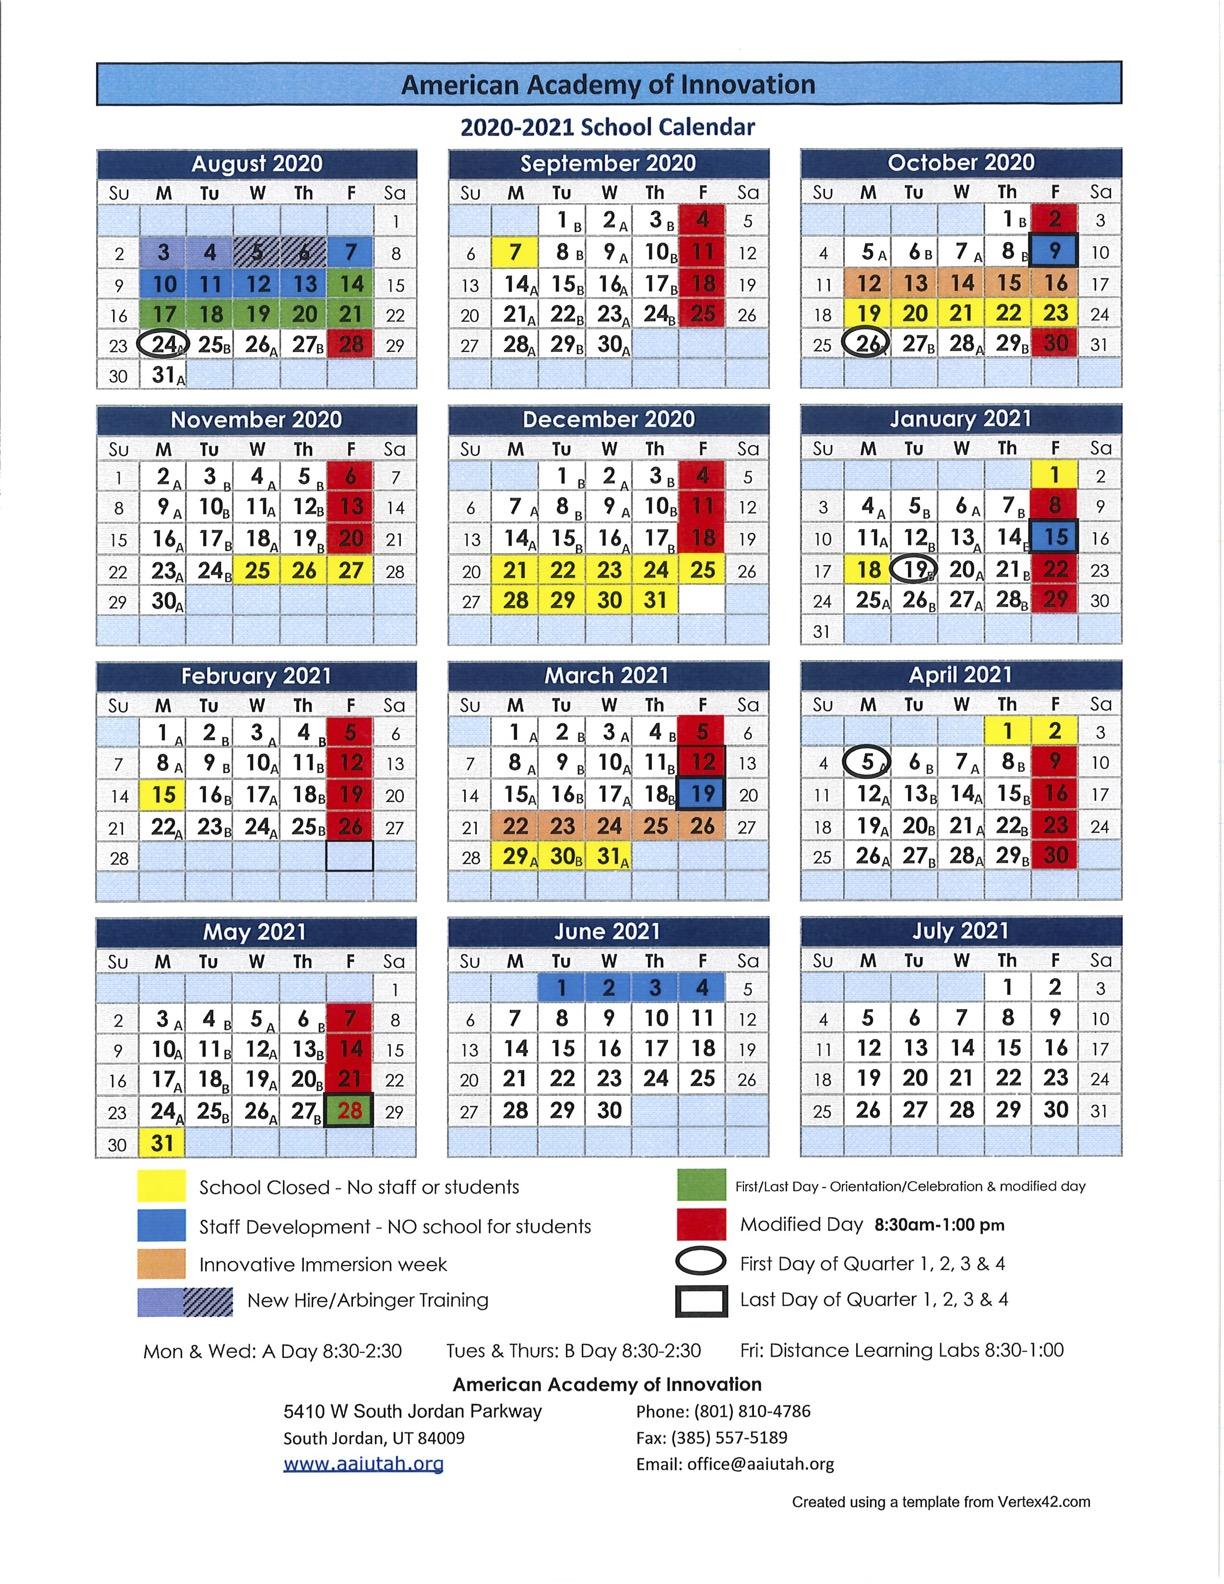 Uvu Fall 2022 Calendar.Academic Calendar American Academy Of Innovation